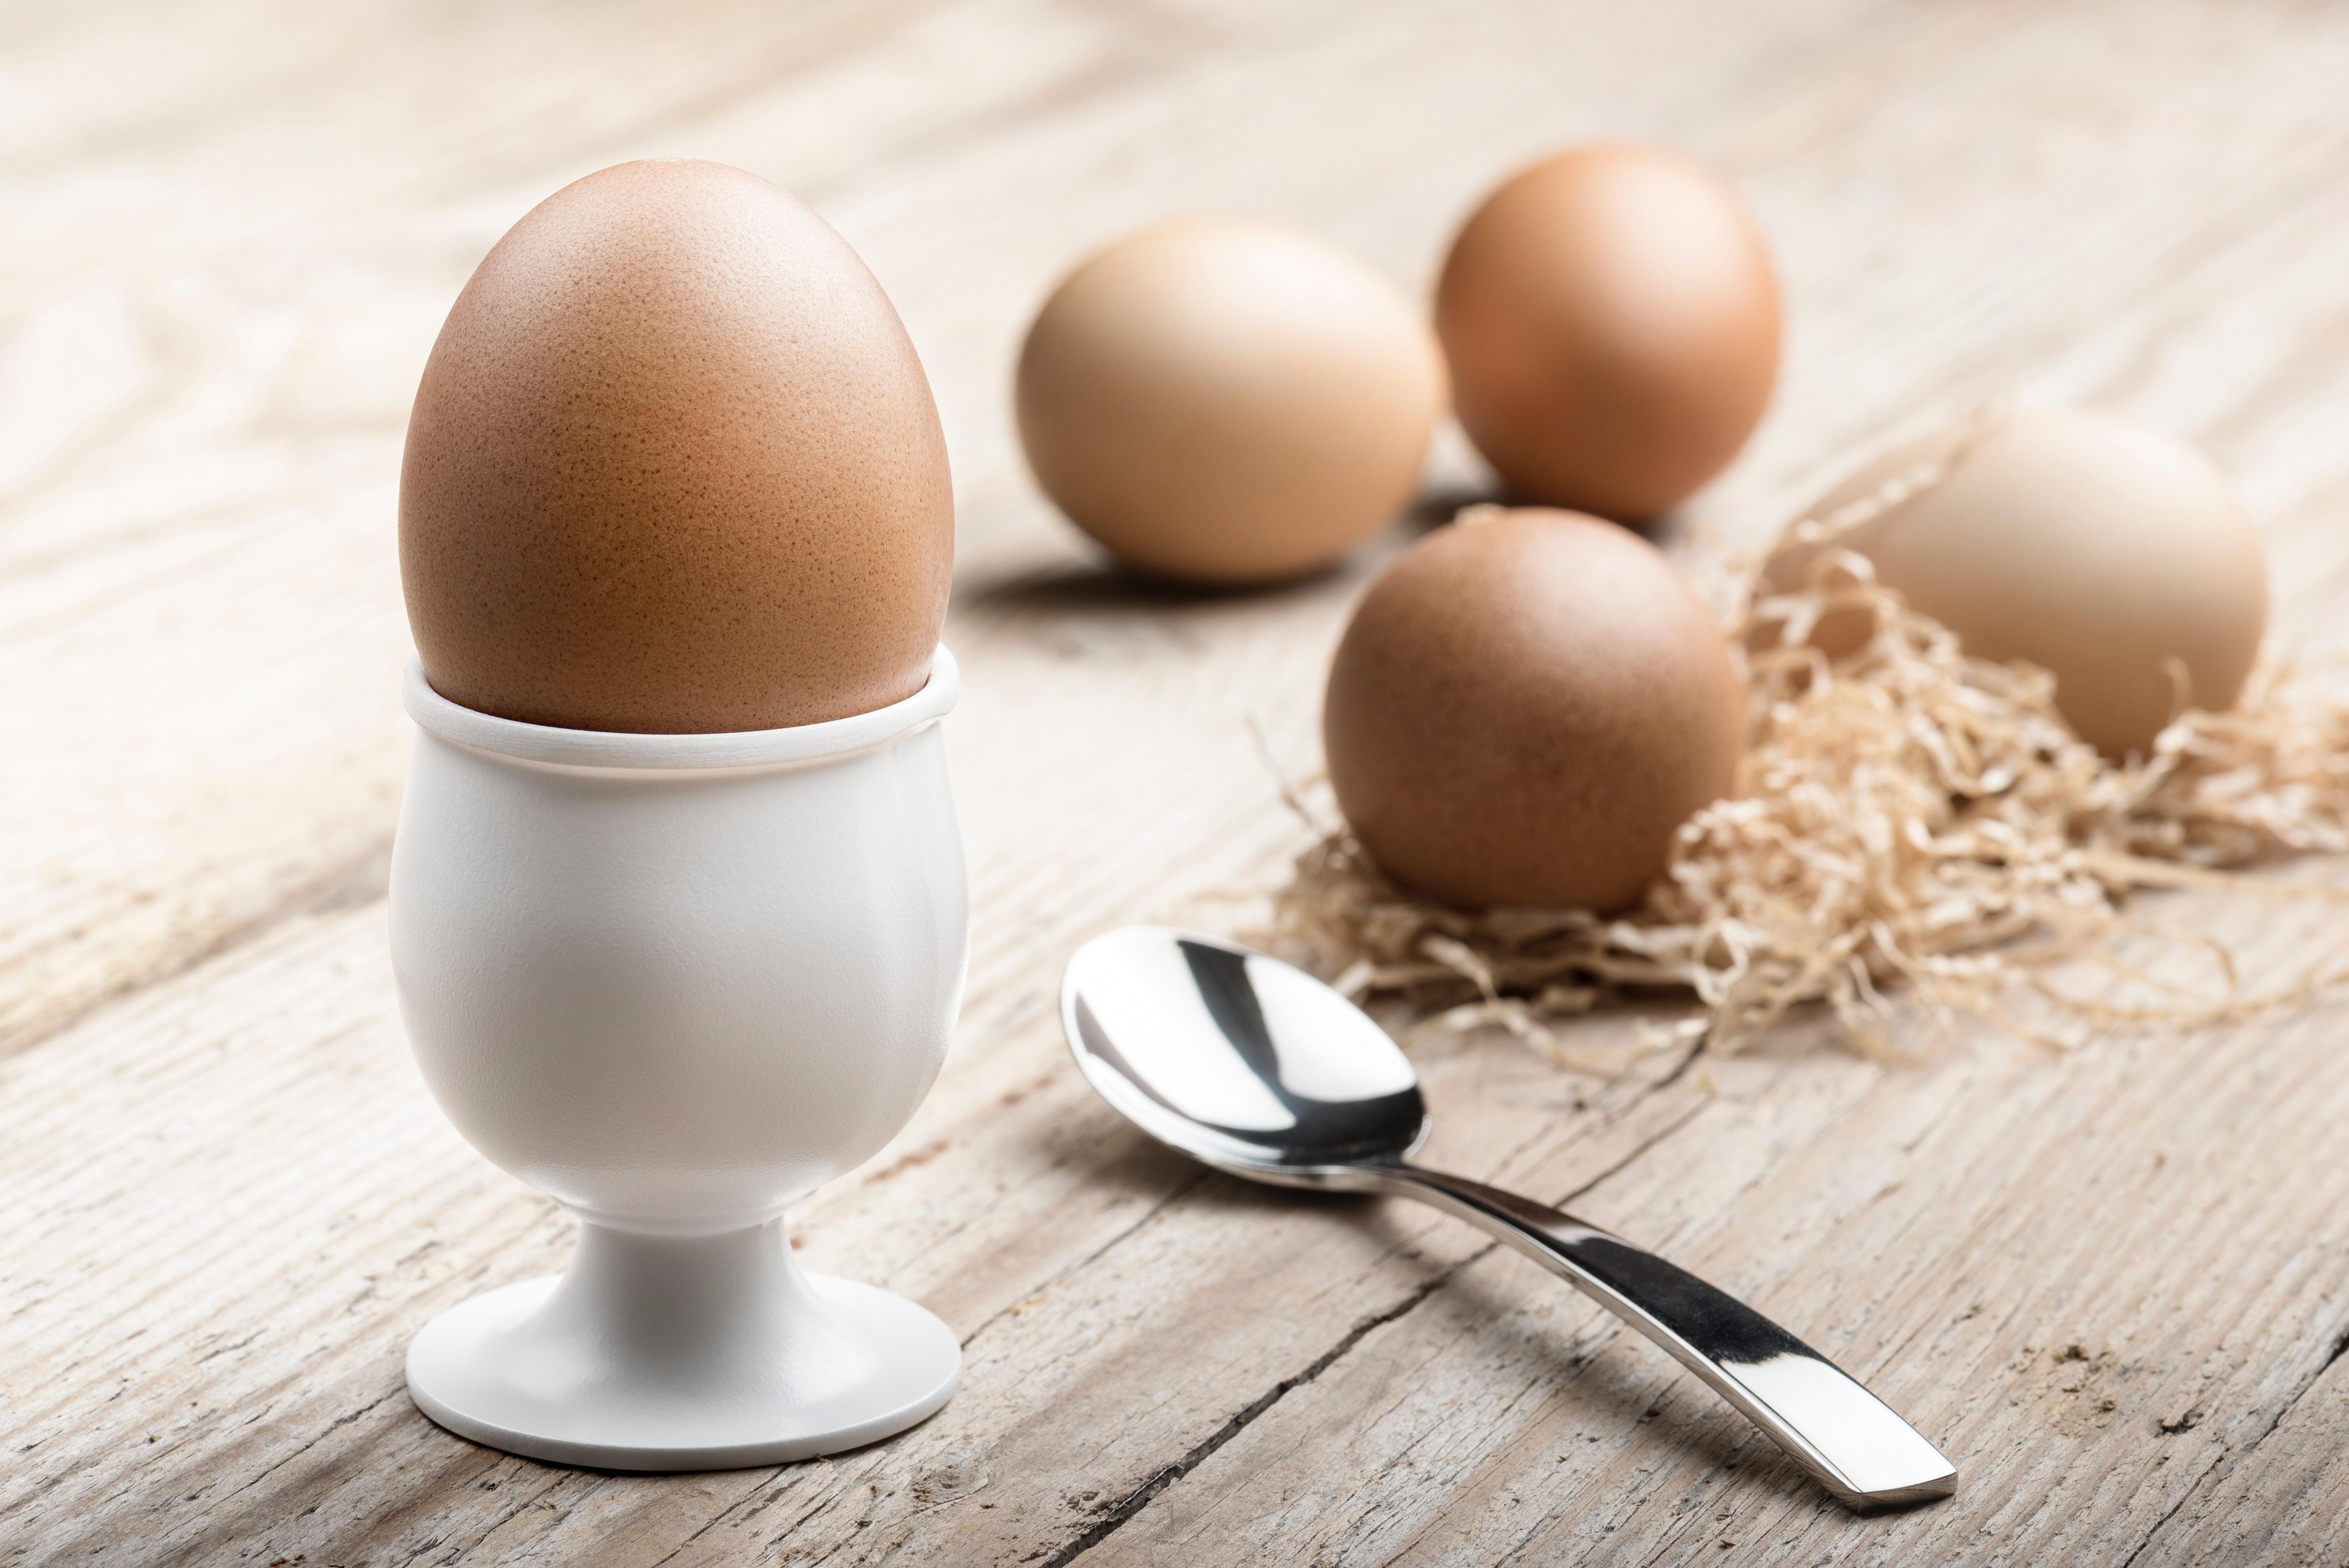 Egg | Cholesterol | 21 Day Full Body Cleanse